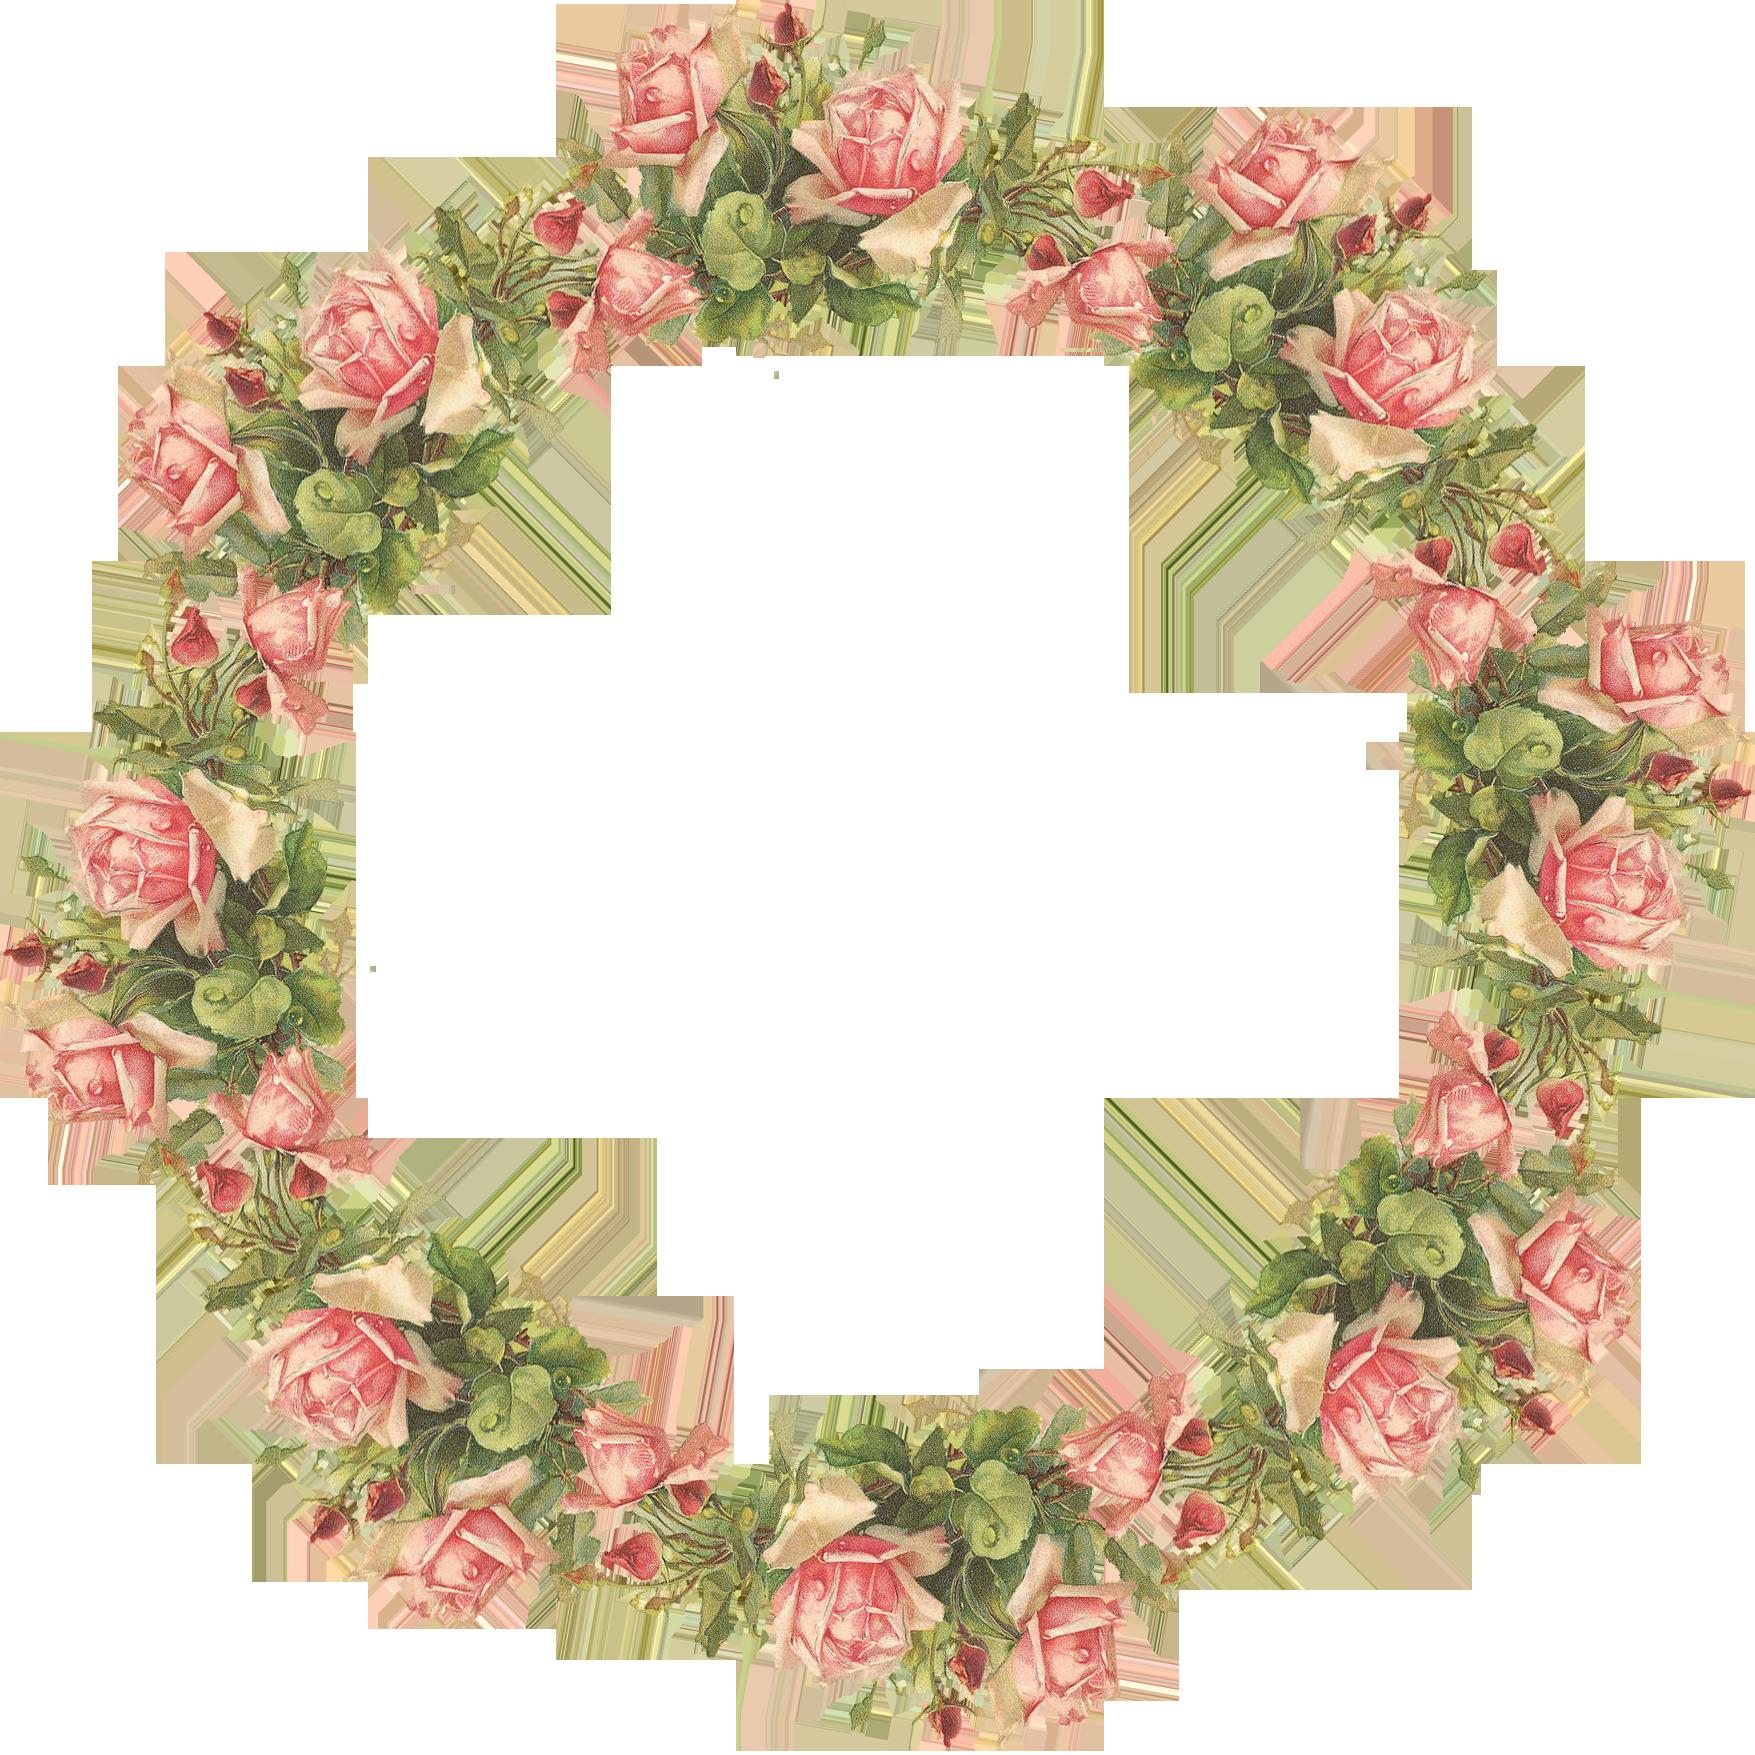 Catherine Klein Pink Roses Digital Elements Vintage Flowers Wreath Clip Art Flower Frame